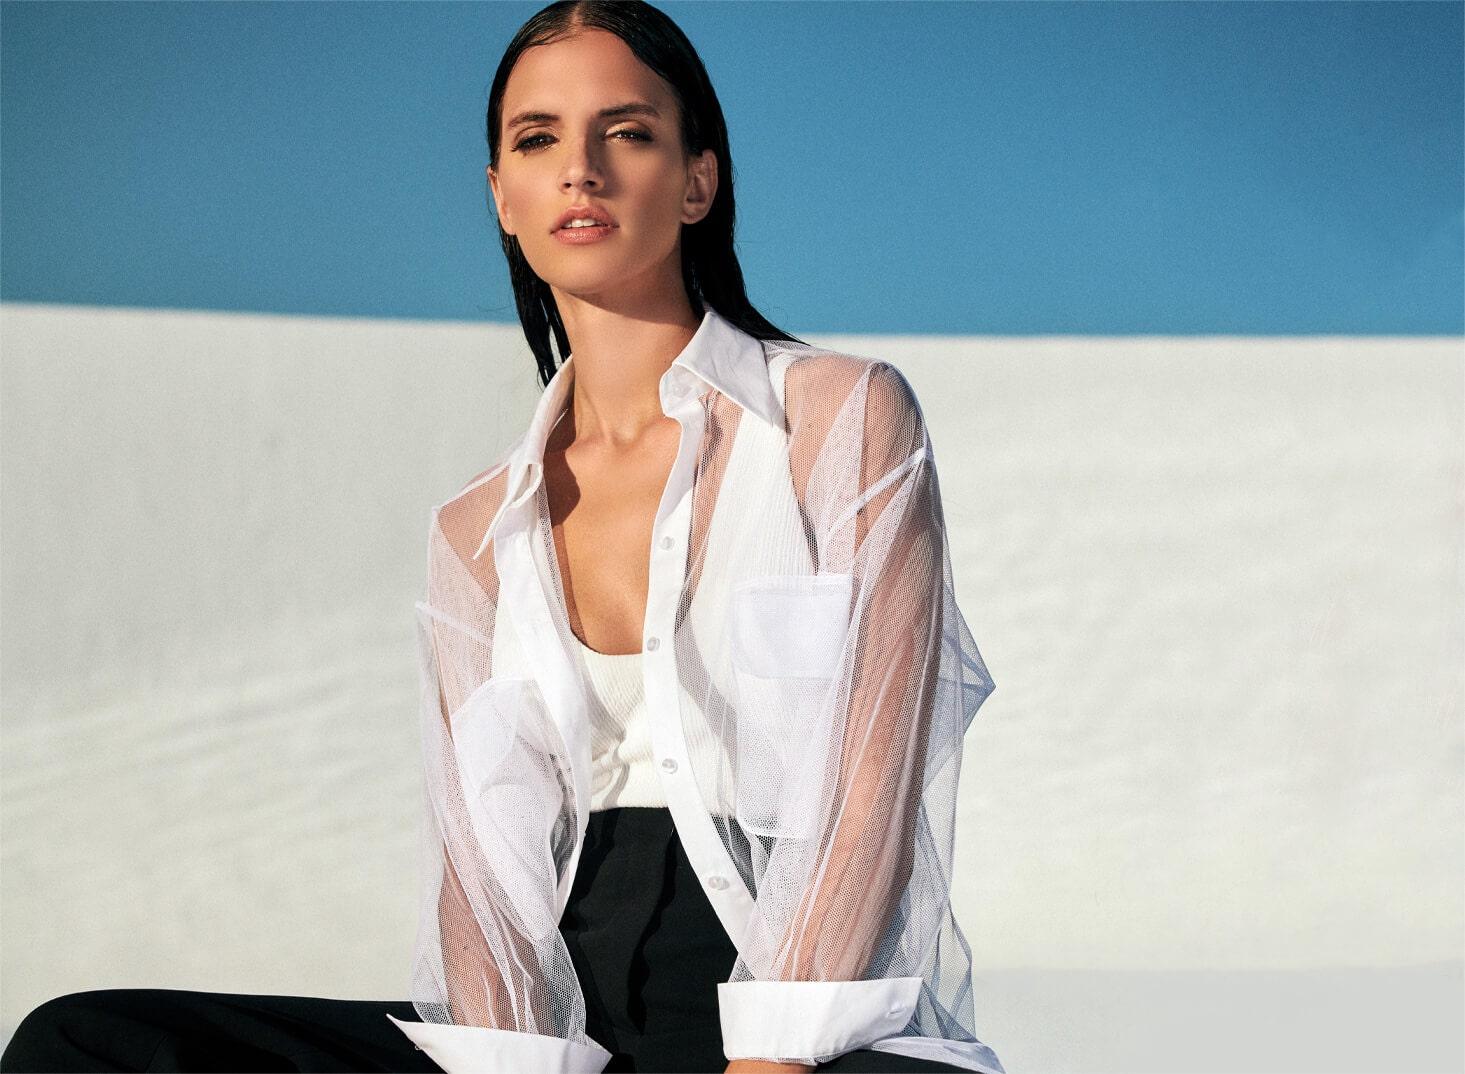 Designer Anne Fontaine's Black & White Edit